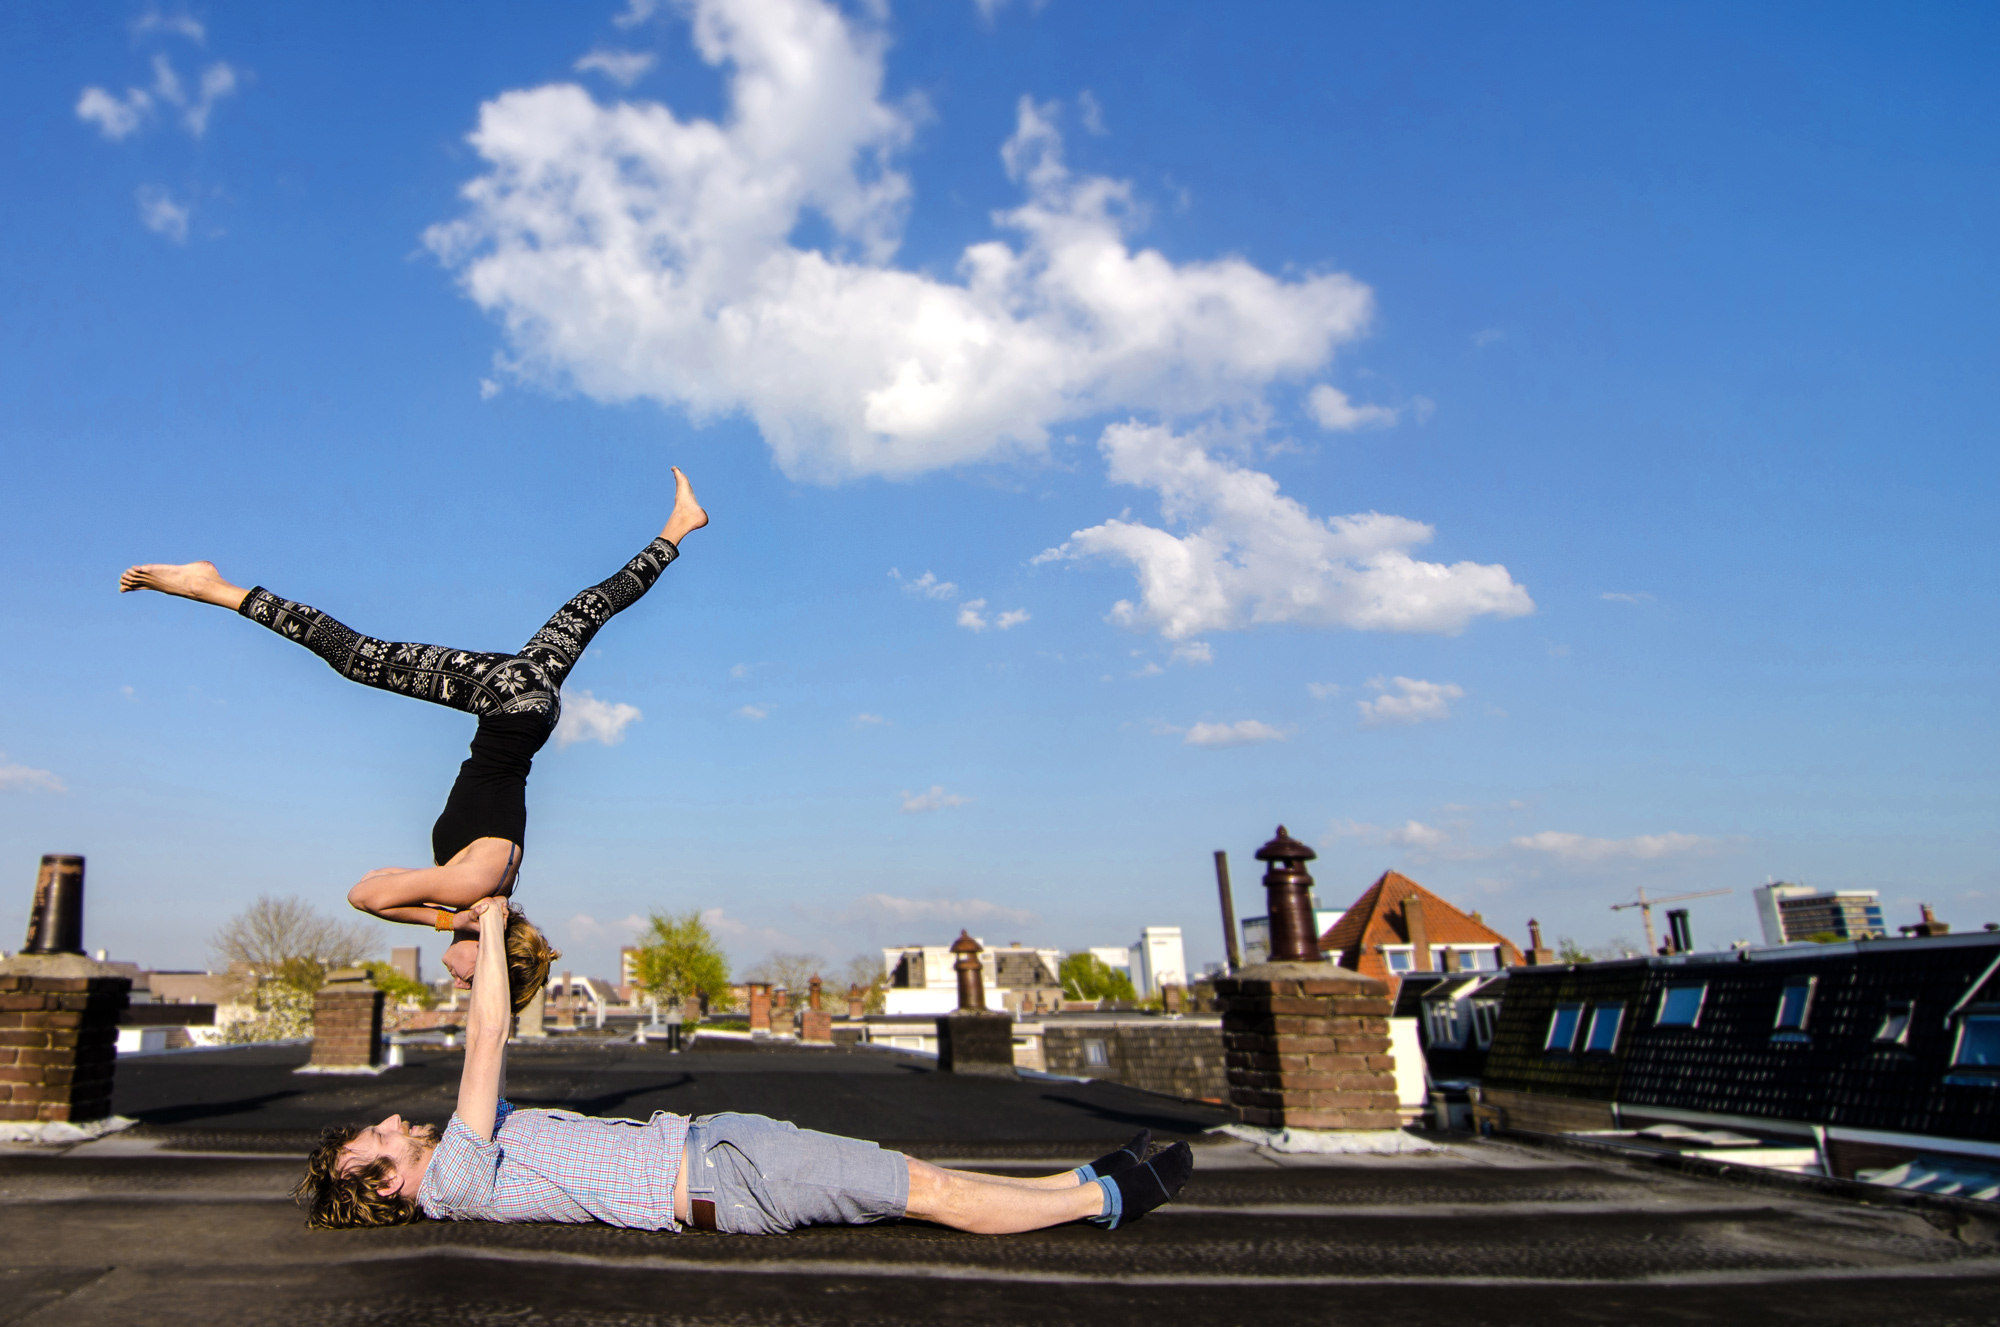 Agi-and-Flo-Slackline-yoga-and-more2